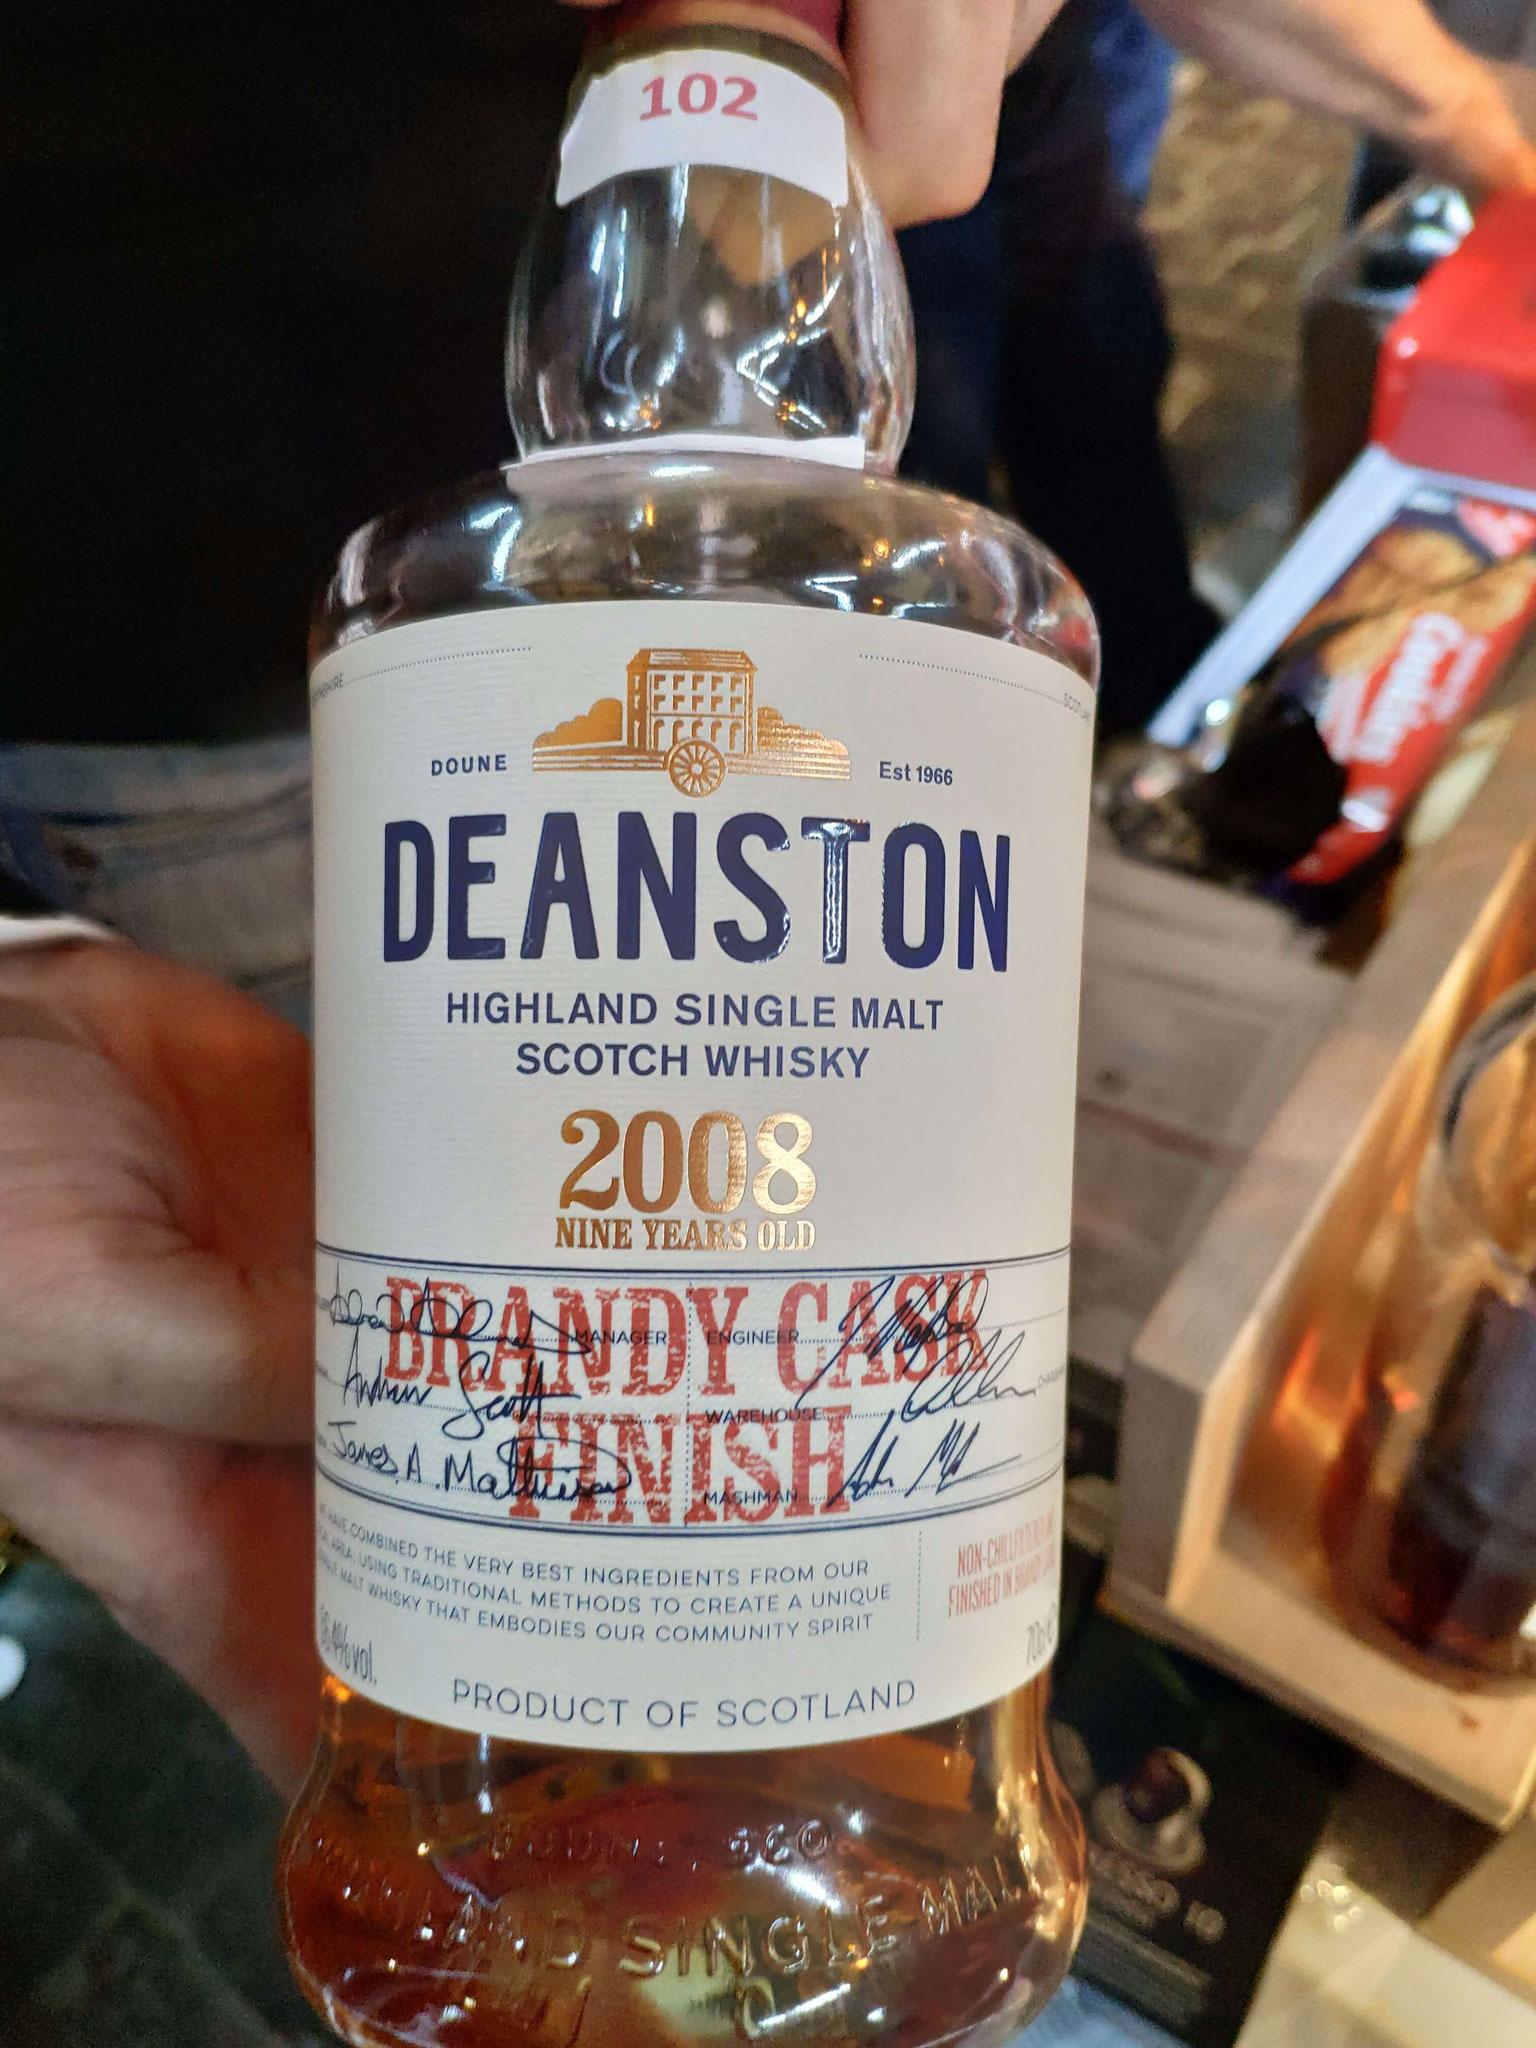 Deanston Brandy Cask